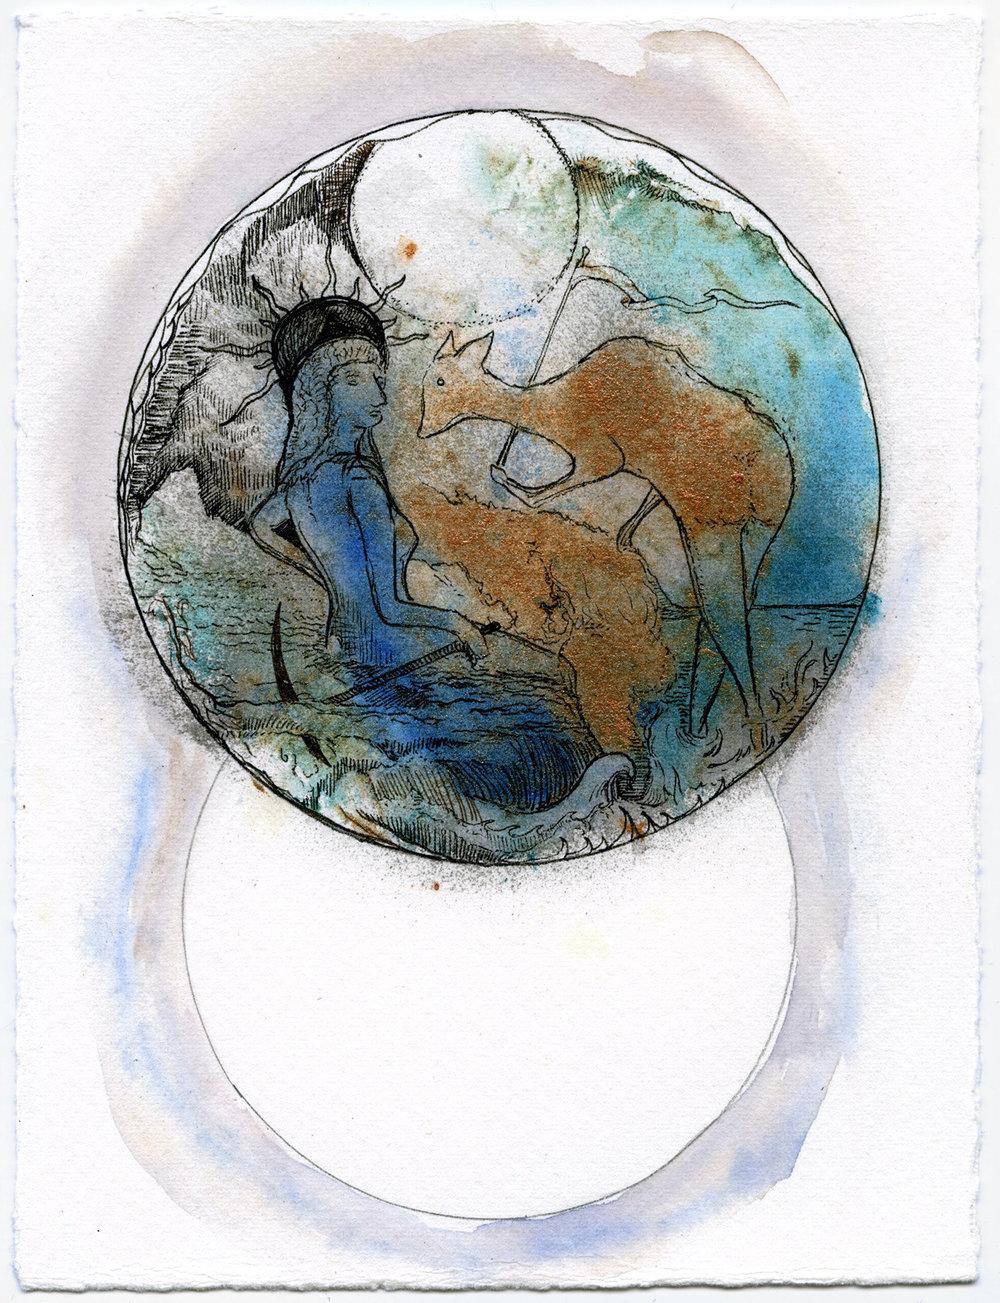 Max Razdow lunar demigoddess painting watercolor